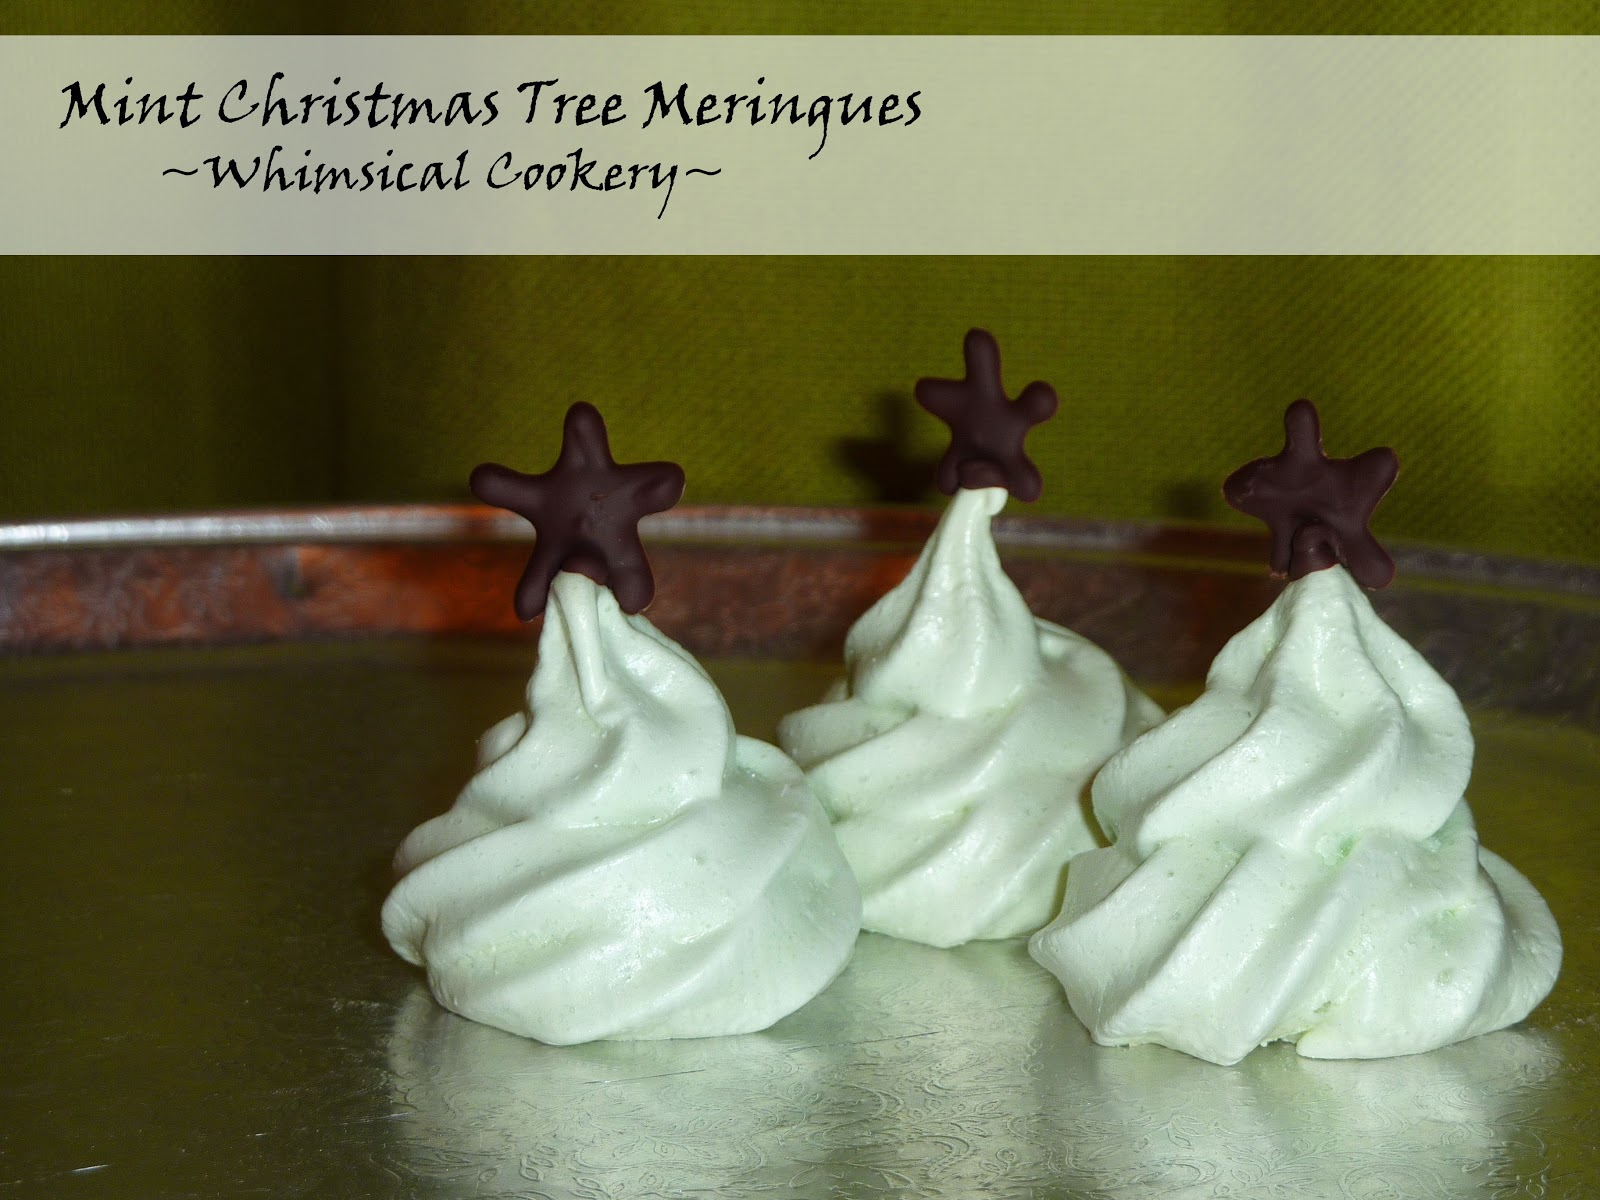 http://whimsicalcookery.blogspot.co.uk/2013/12/mint-christmas-tree-meringues.html